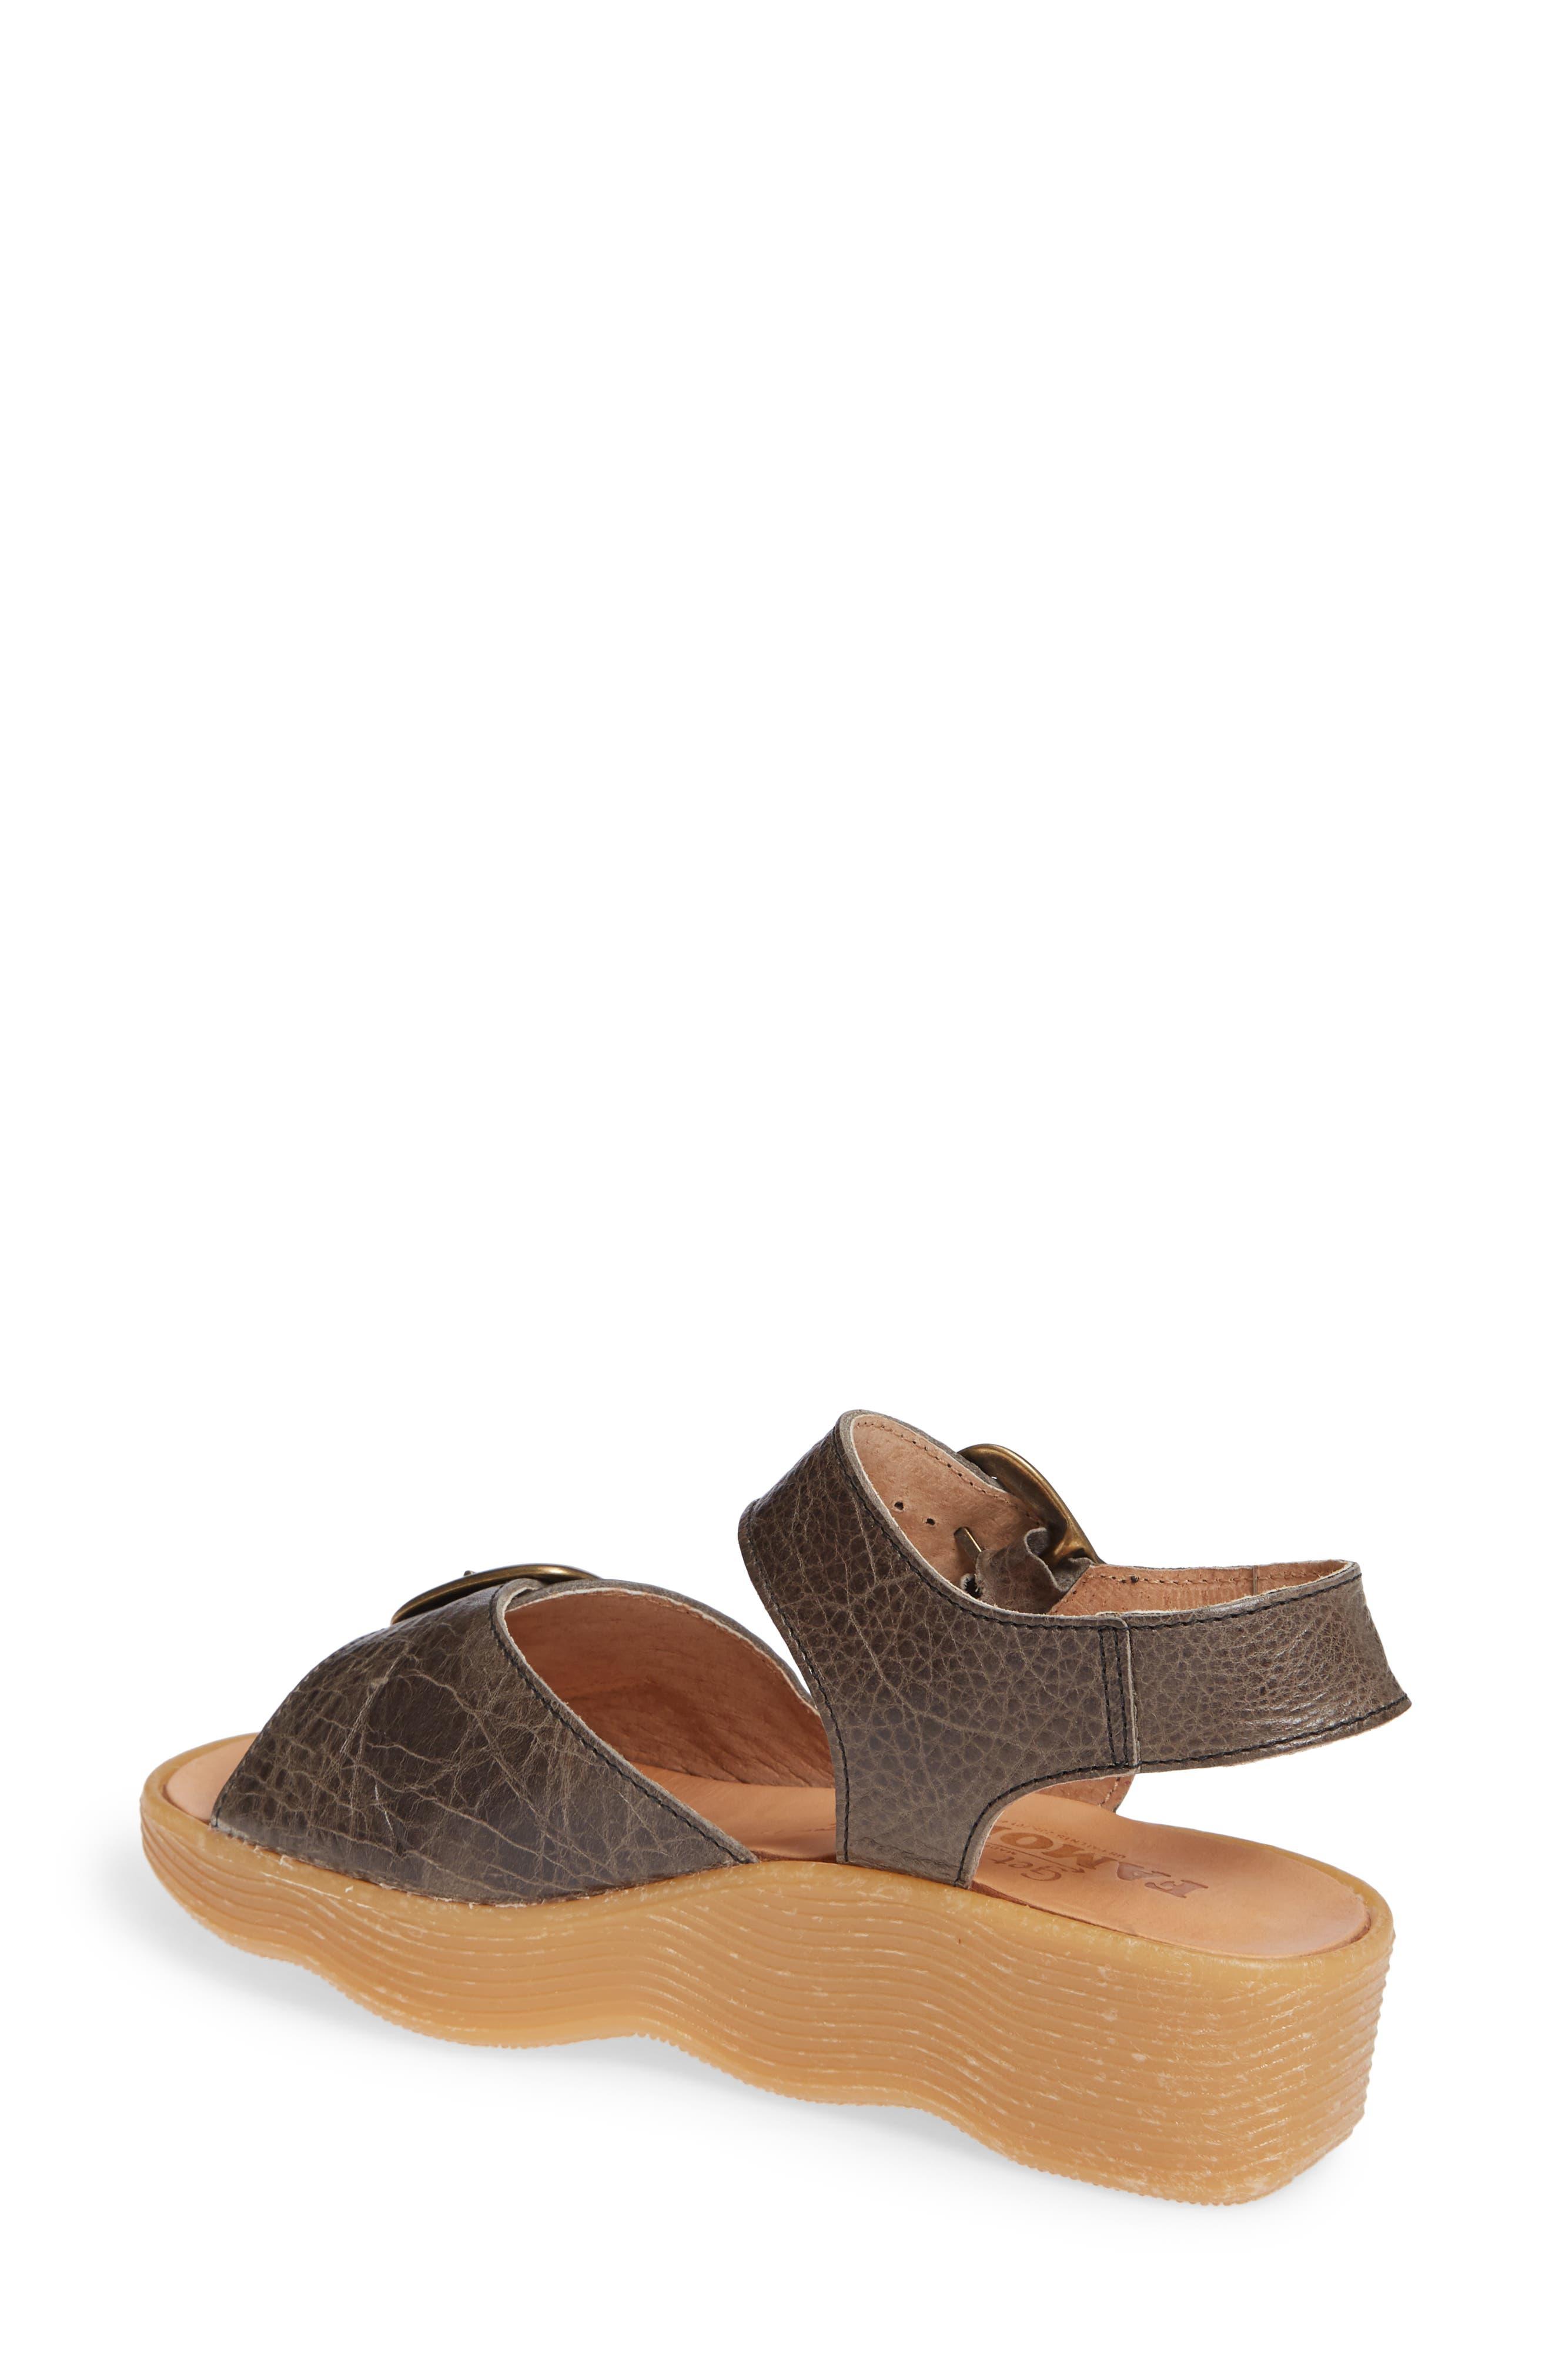 FAMOLARE, Double Play Platform Sandal, Alternate thumbnail 2, color, STEEL SUEDE